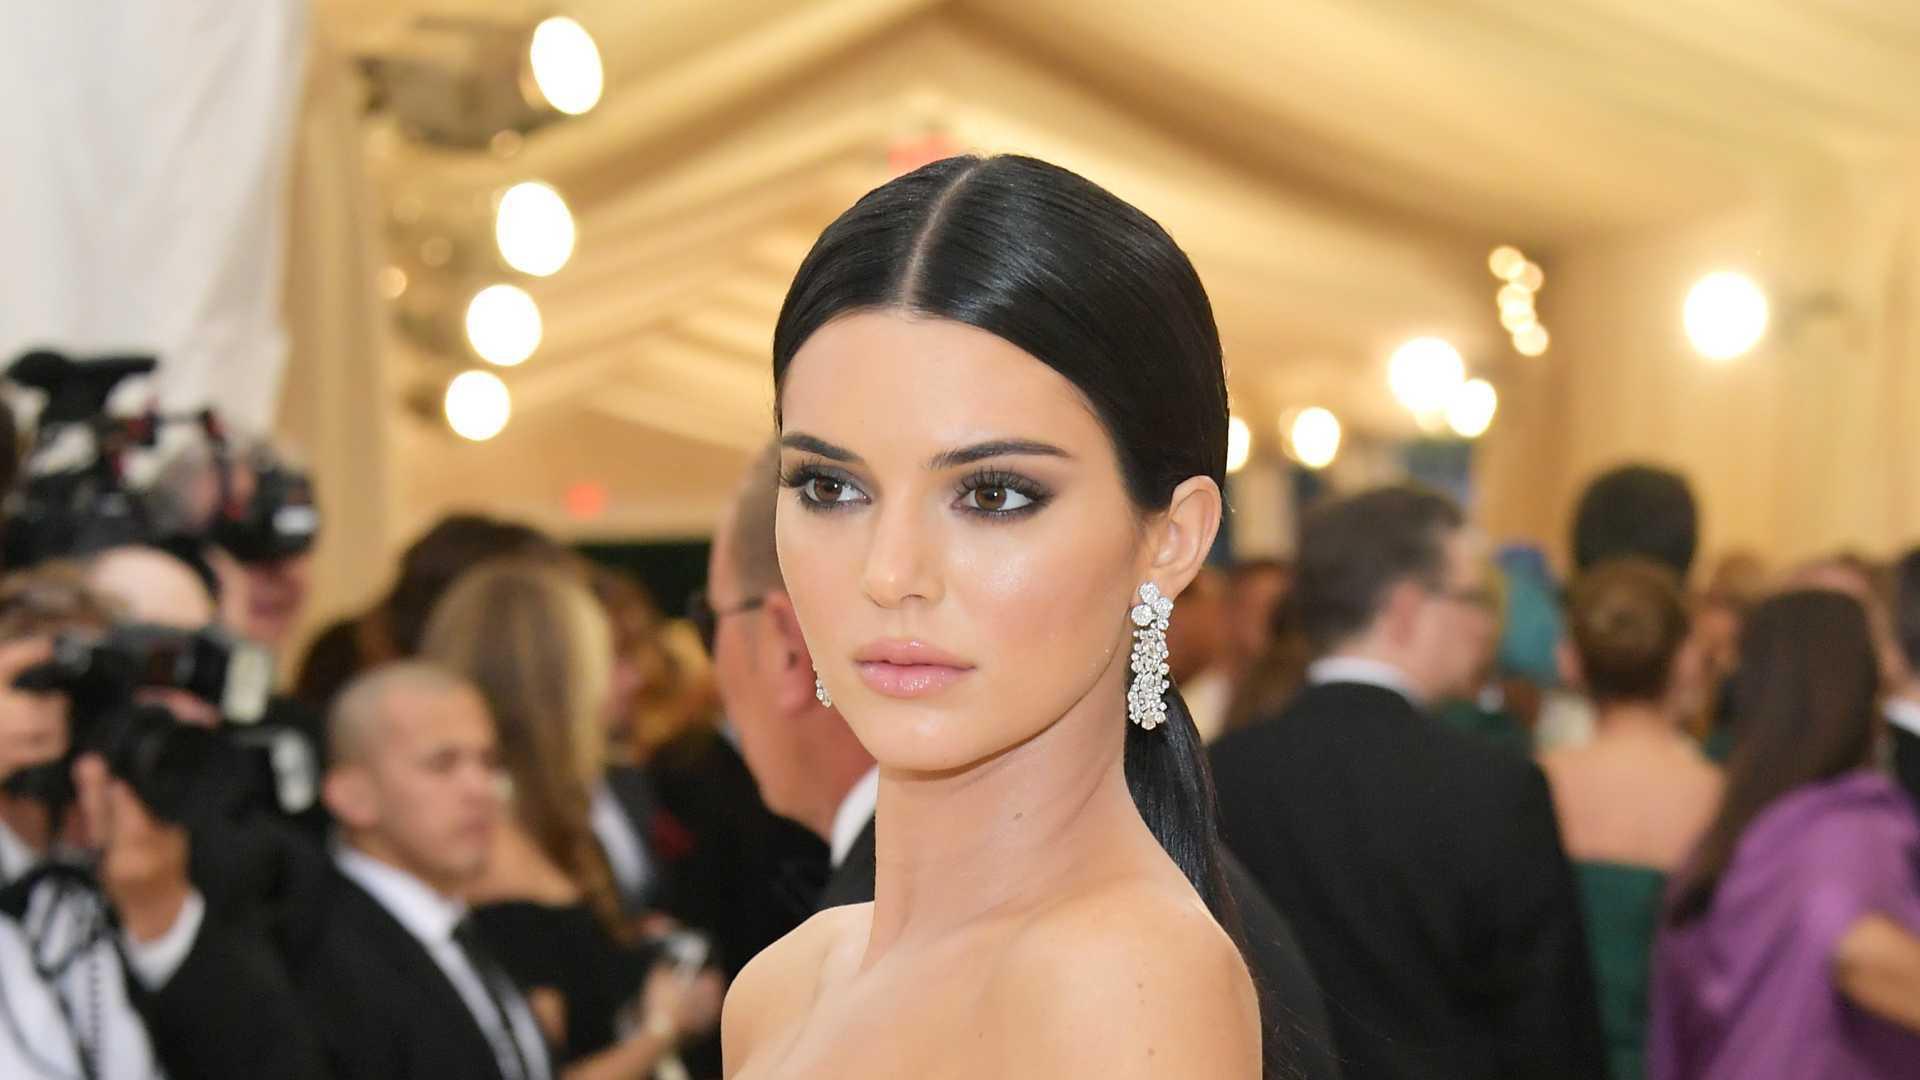 British Fashion Awards: Kendall Jenner opta por look ousado